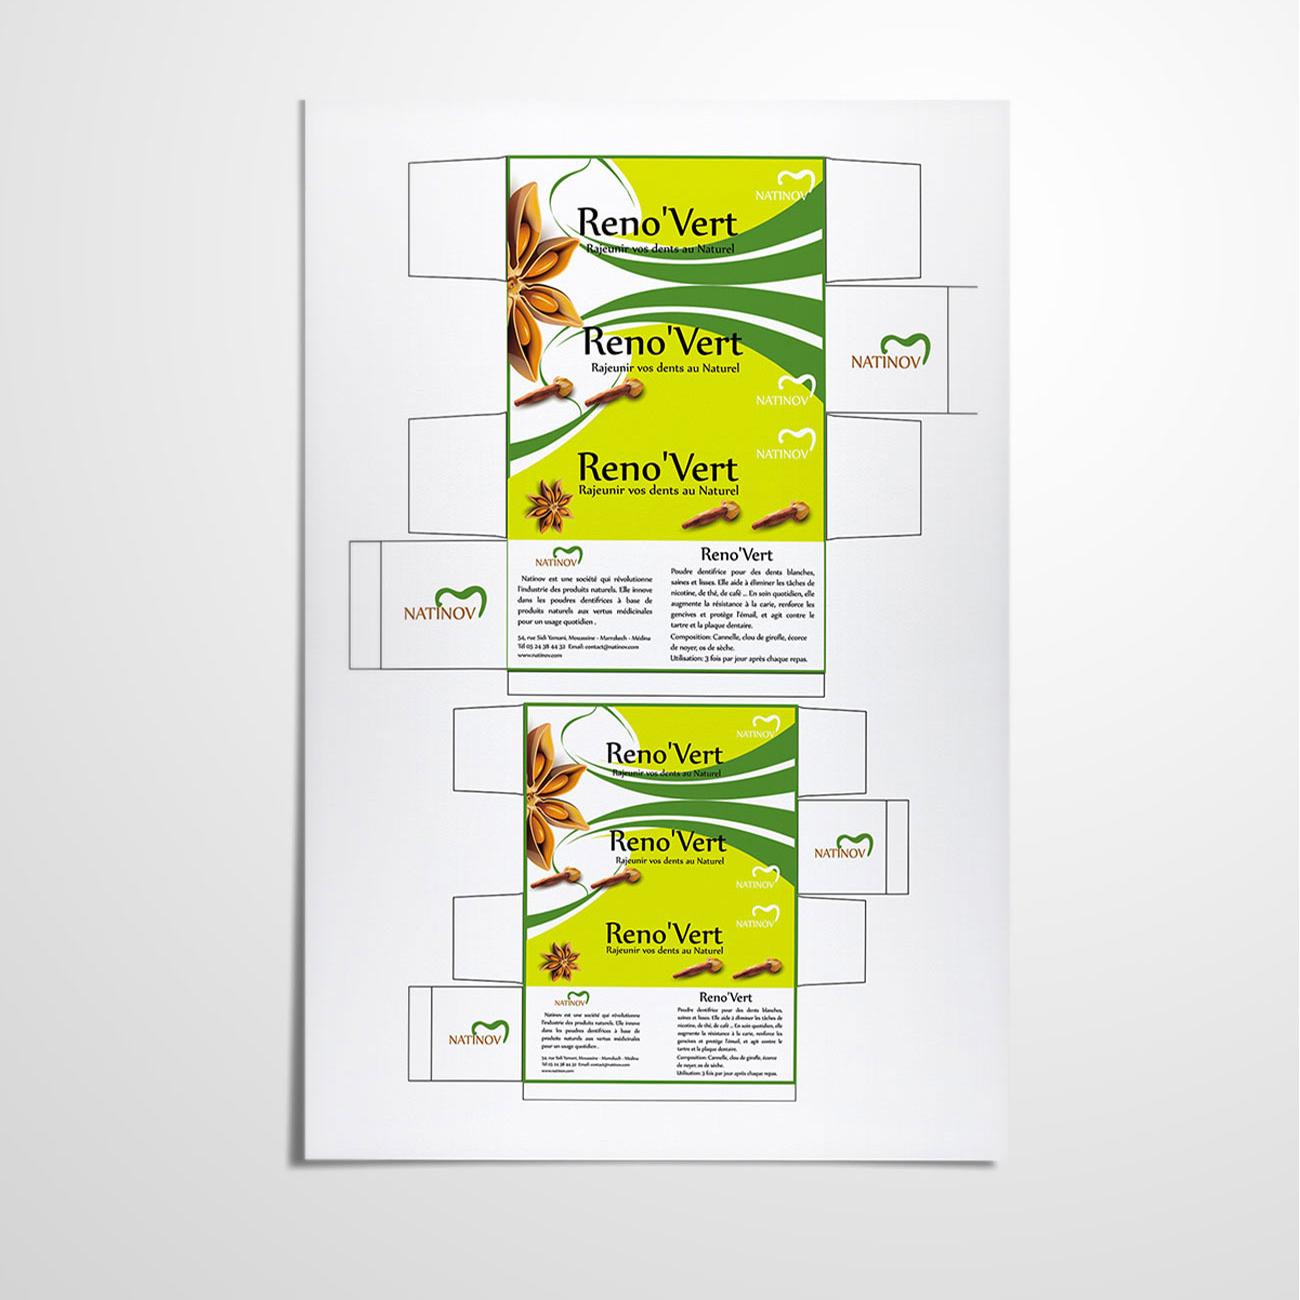 Nationov Reno'vert Packaging